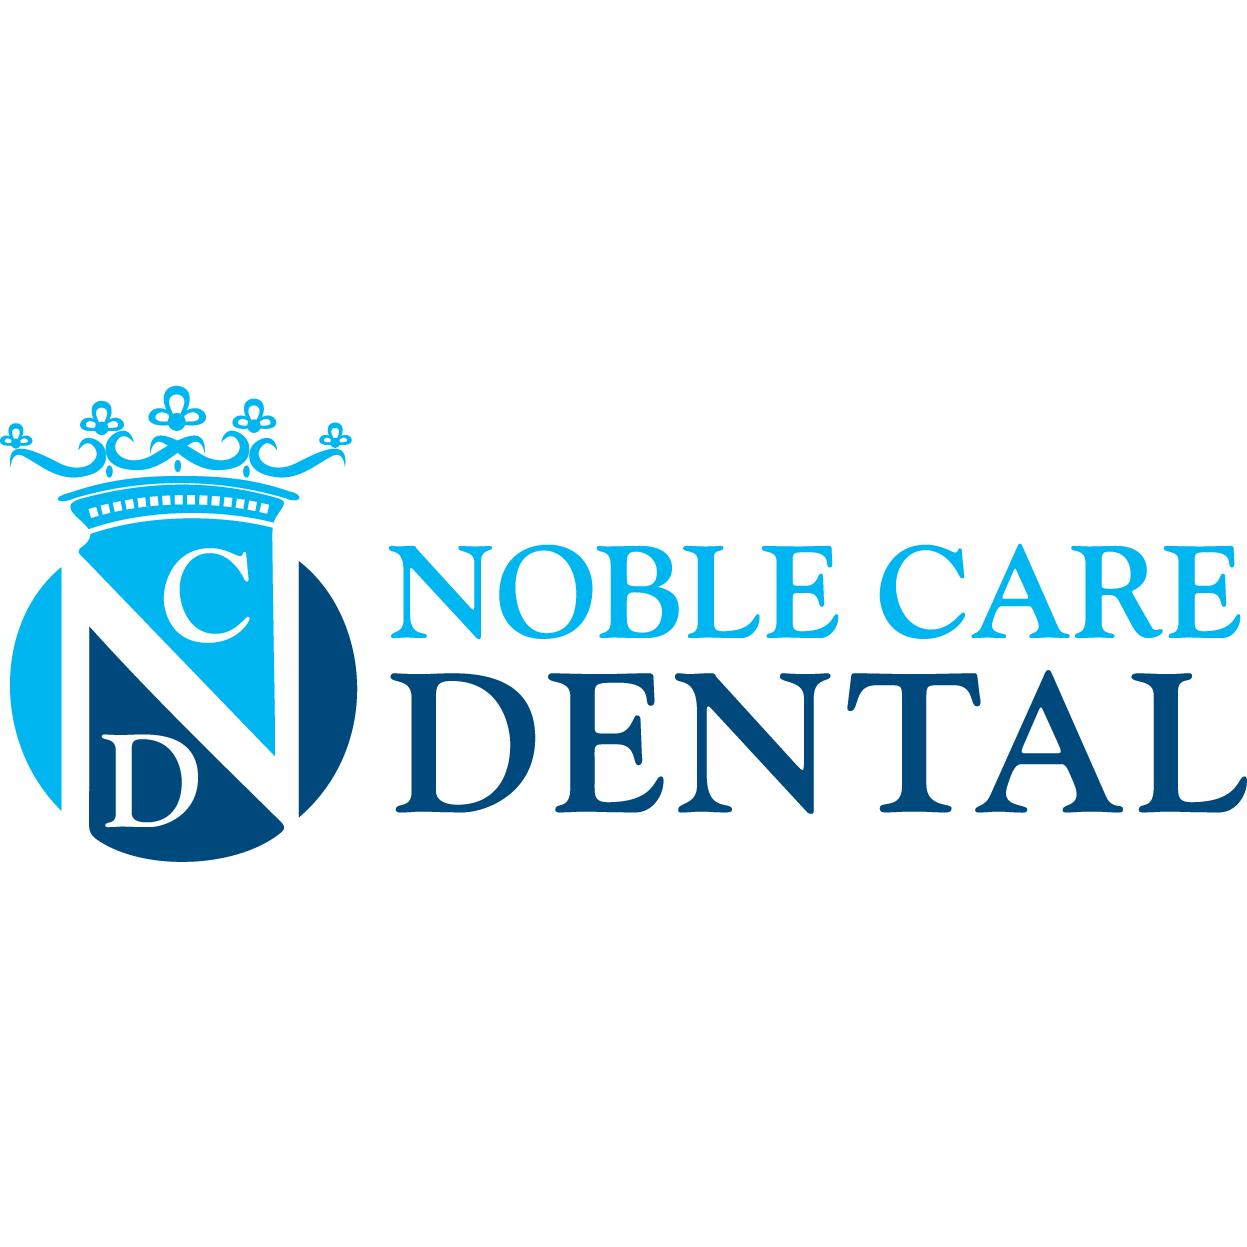 NobleCare Dental - Raya Flayeh